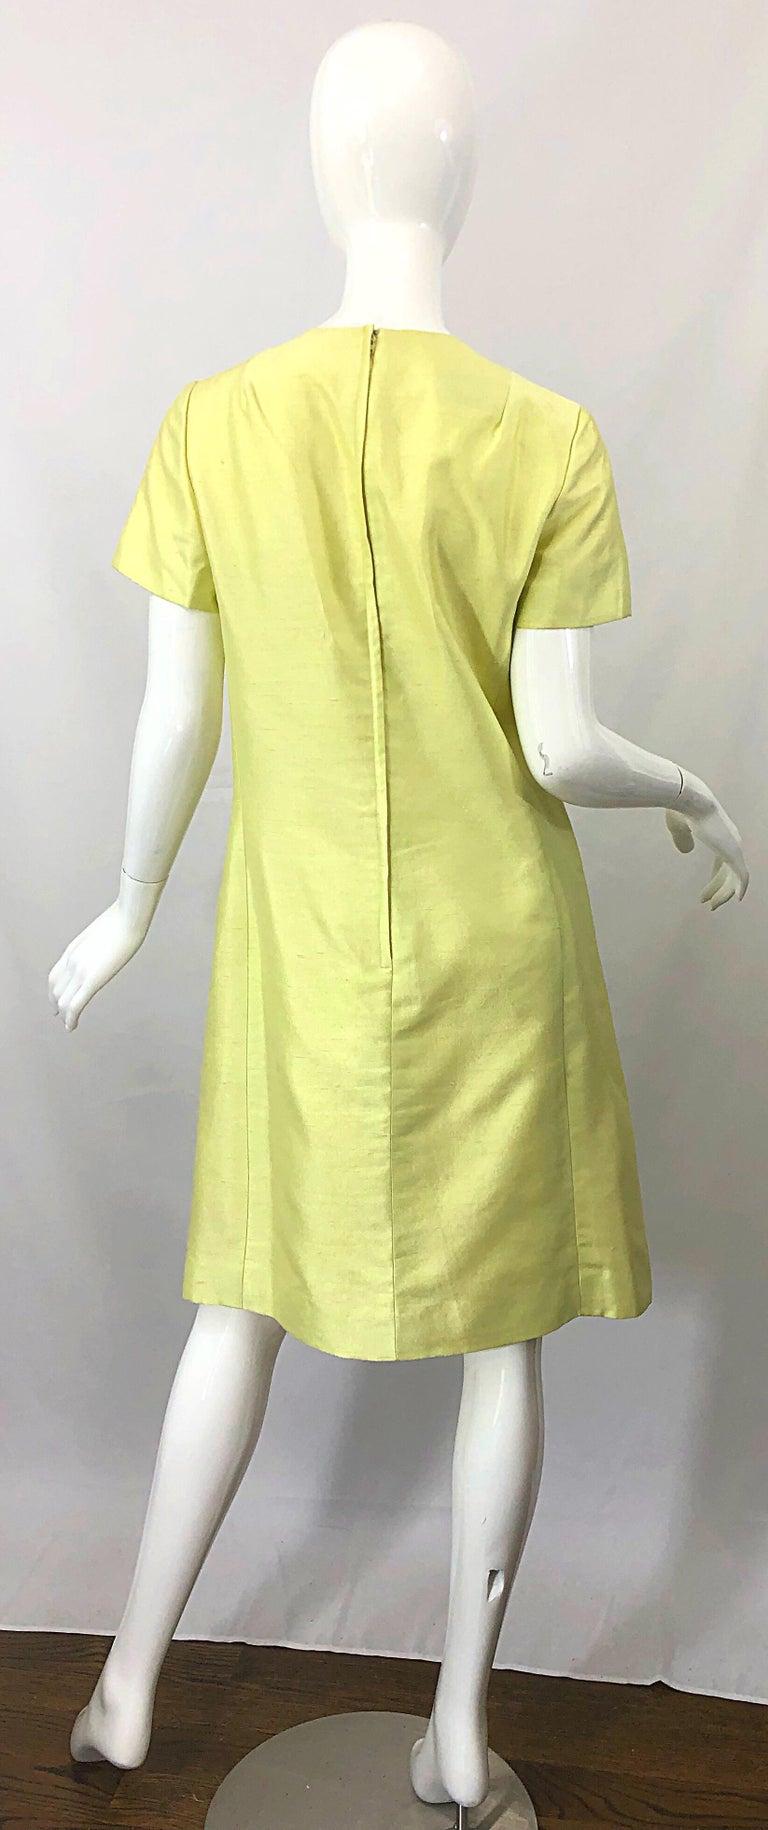 1960s Jack Bryan Yellow Silk Rhinestone Beaded 60s A-Line Dress + Jacket Suit For Sale 3